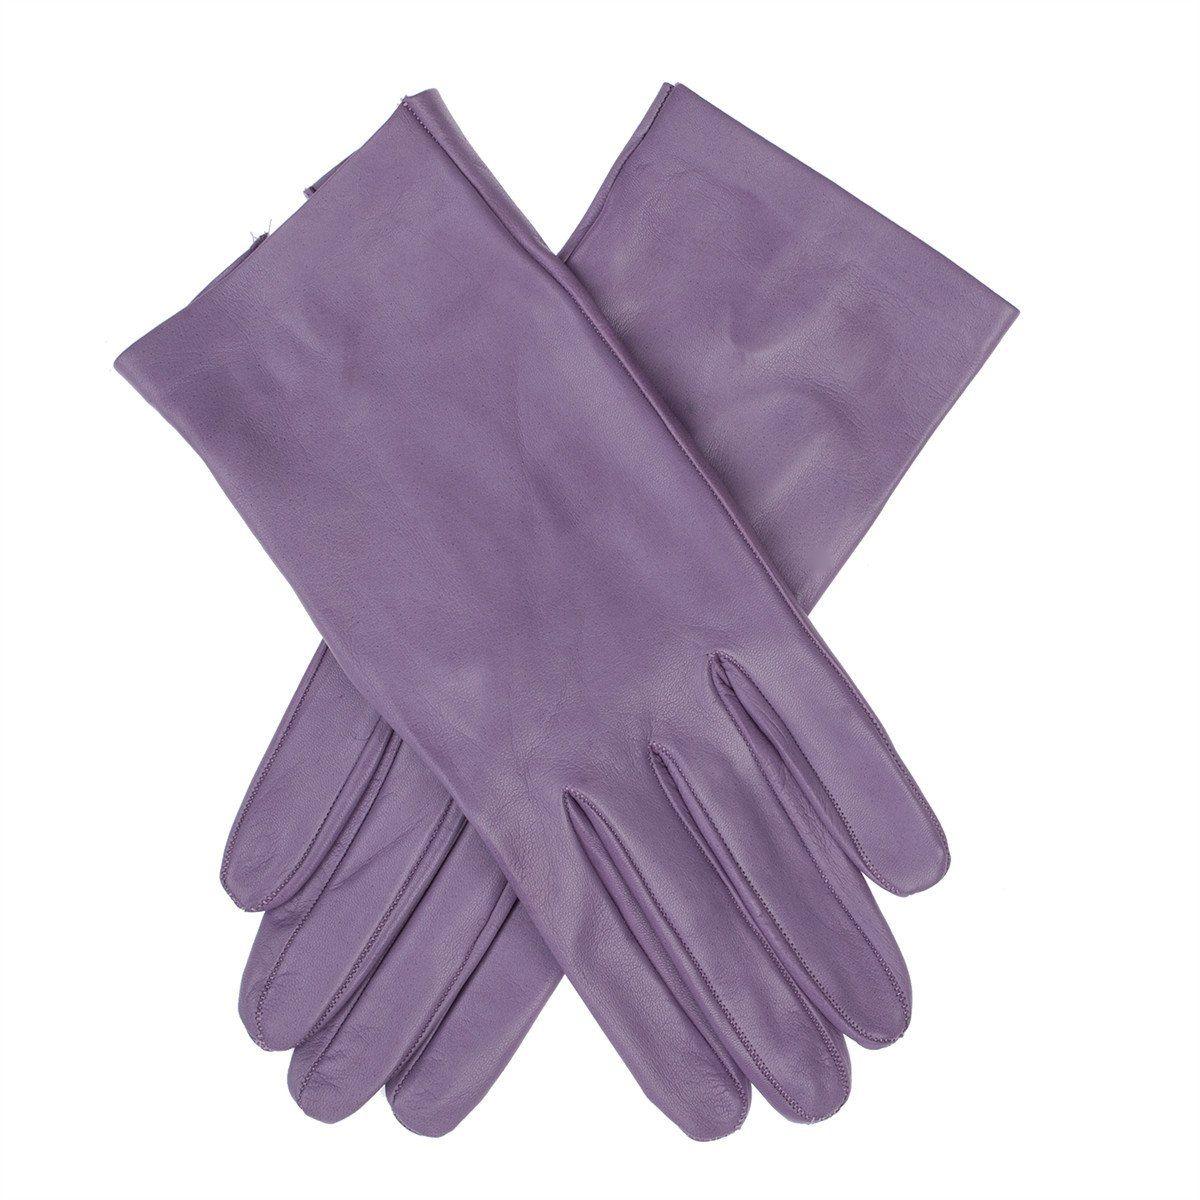 Womens leather gloves purple - Lundorf Flora Womens Unlined Leather Gloves Purple Size 8